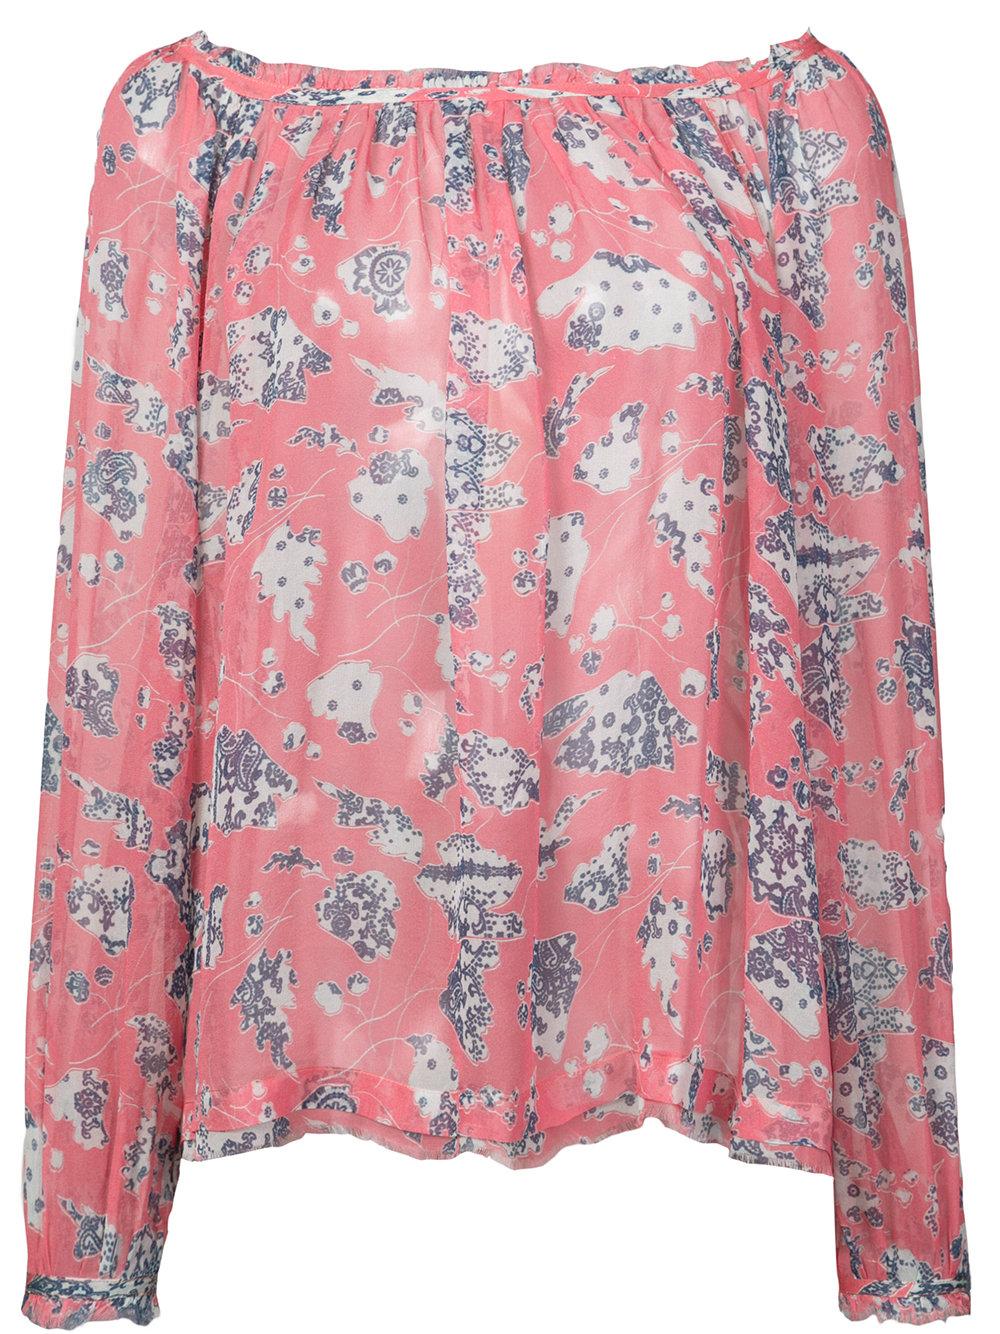 Raquel Allegra   Floral Long Sleeve Top